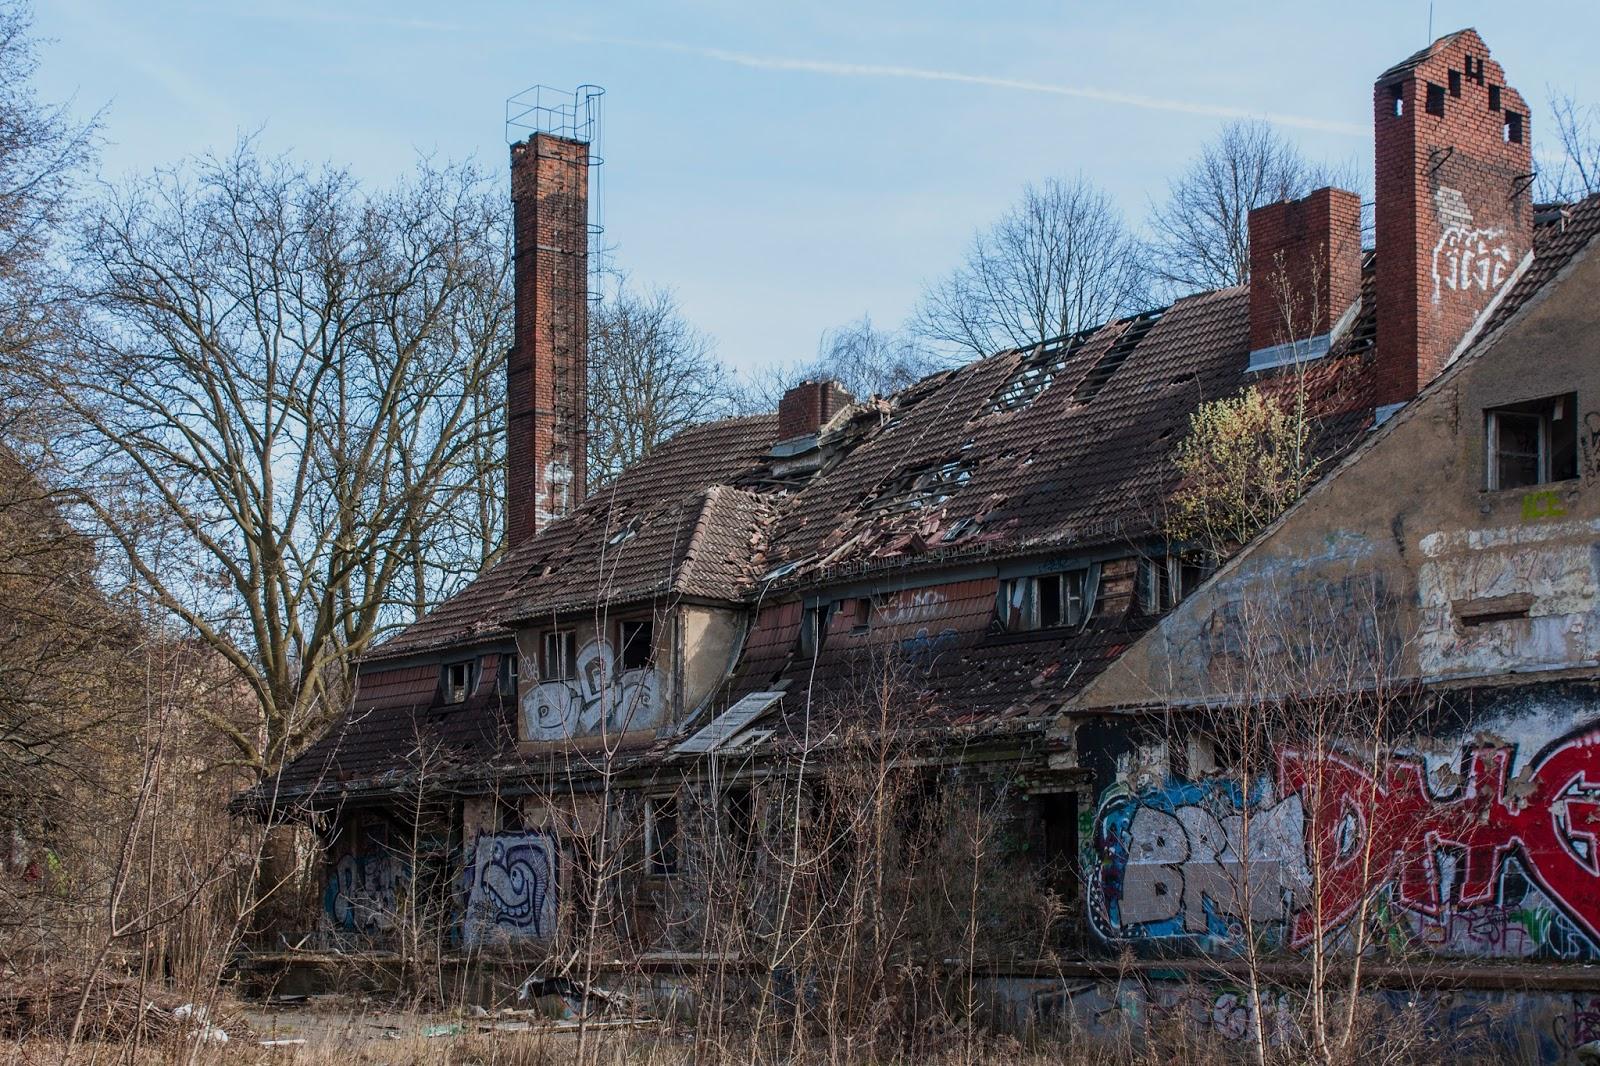 gruselige verlassene orte